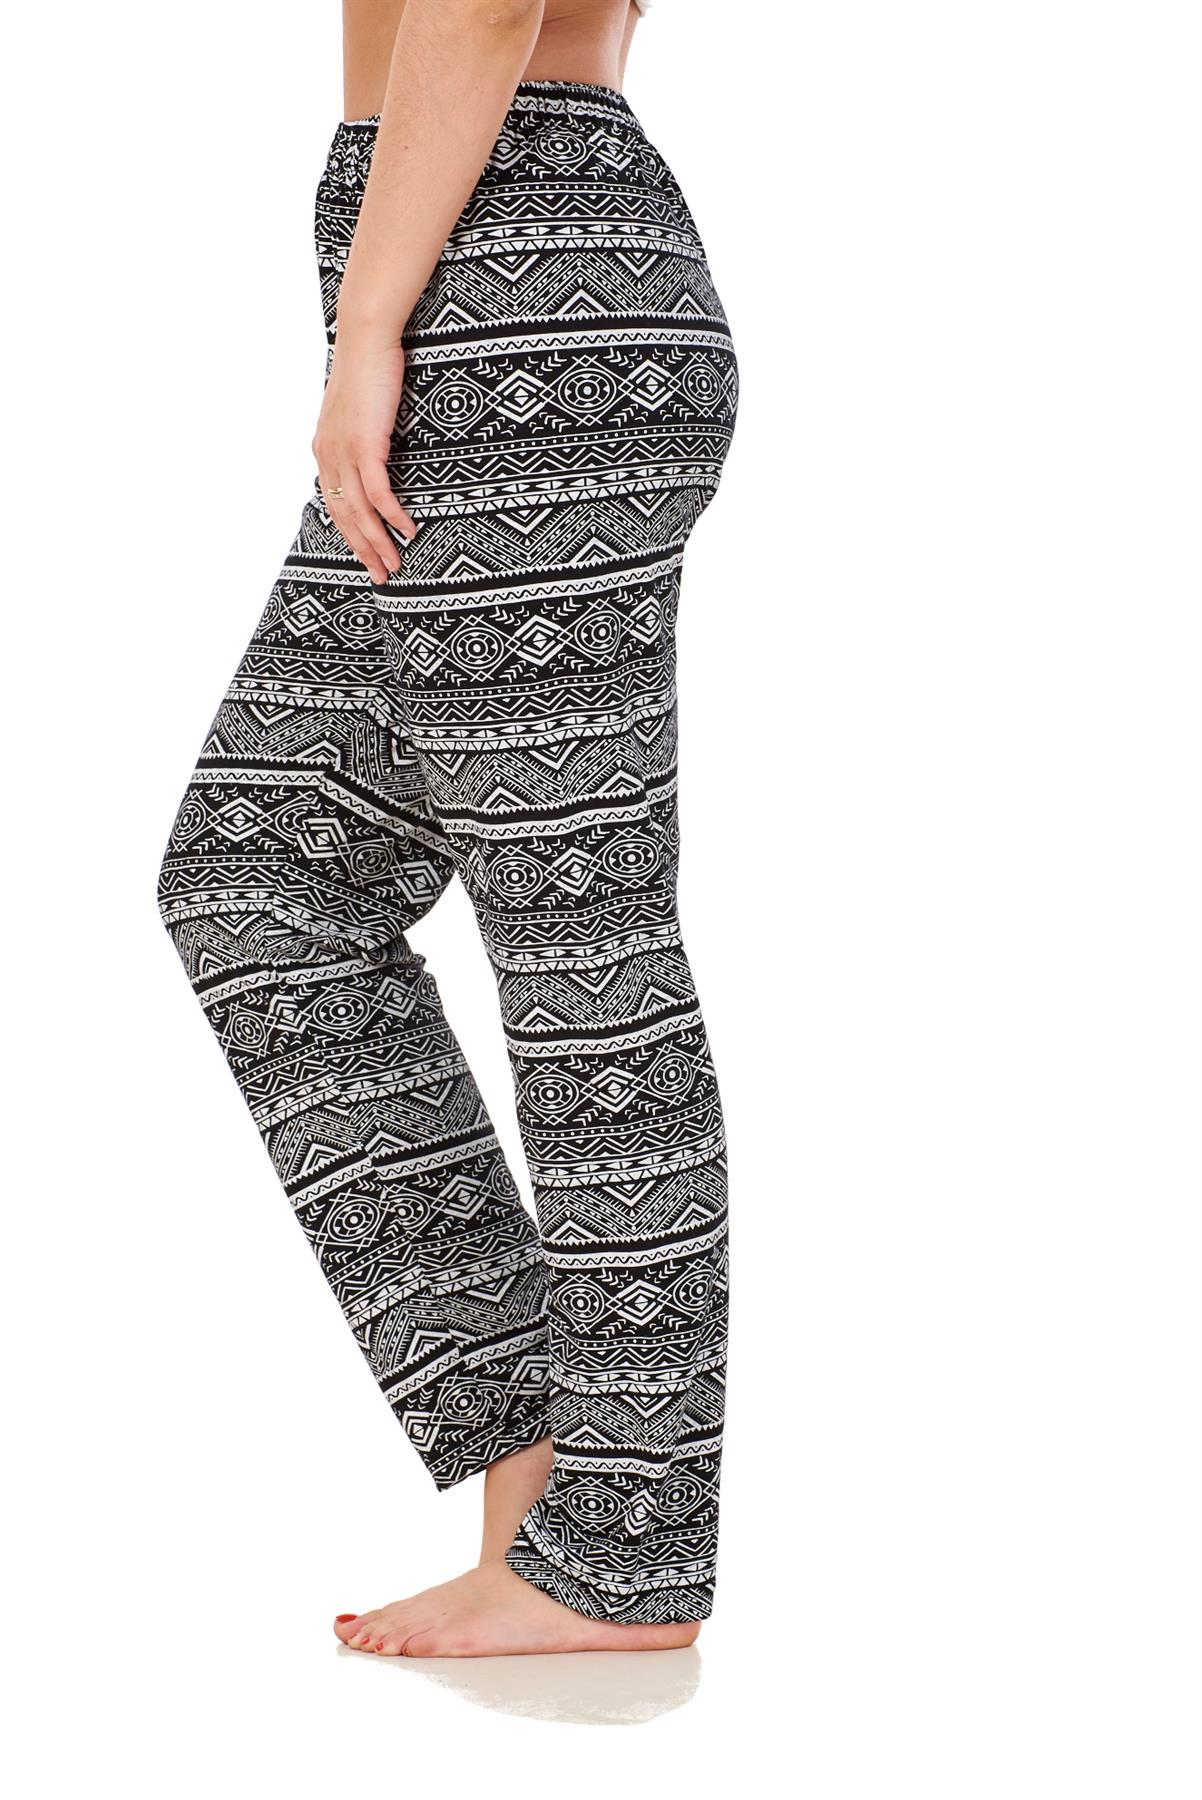 Ladies-Women-Trouser-Elasticated-Printed-Tapered-Harem-High-waist-Regular-Pants thumbnail 15